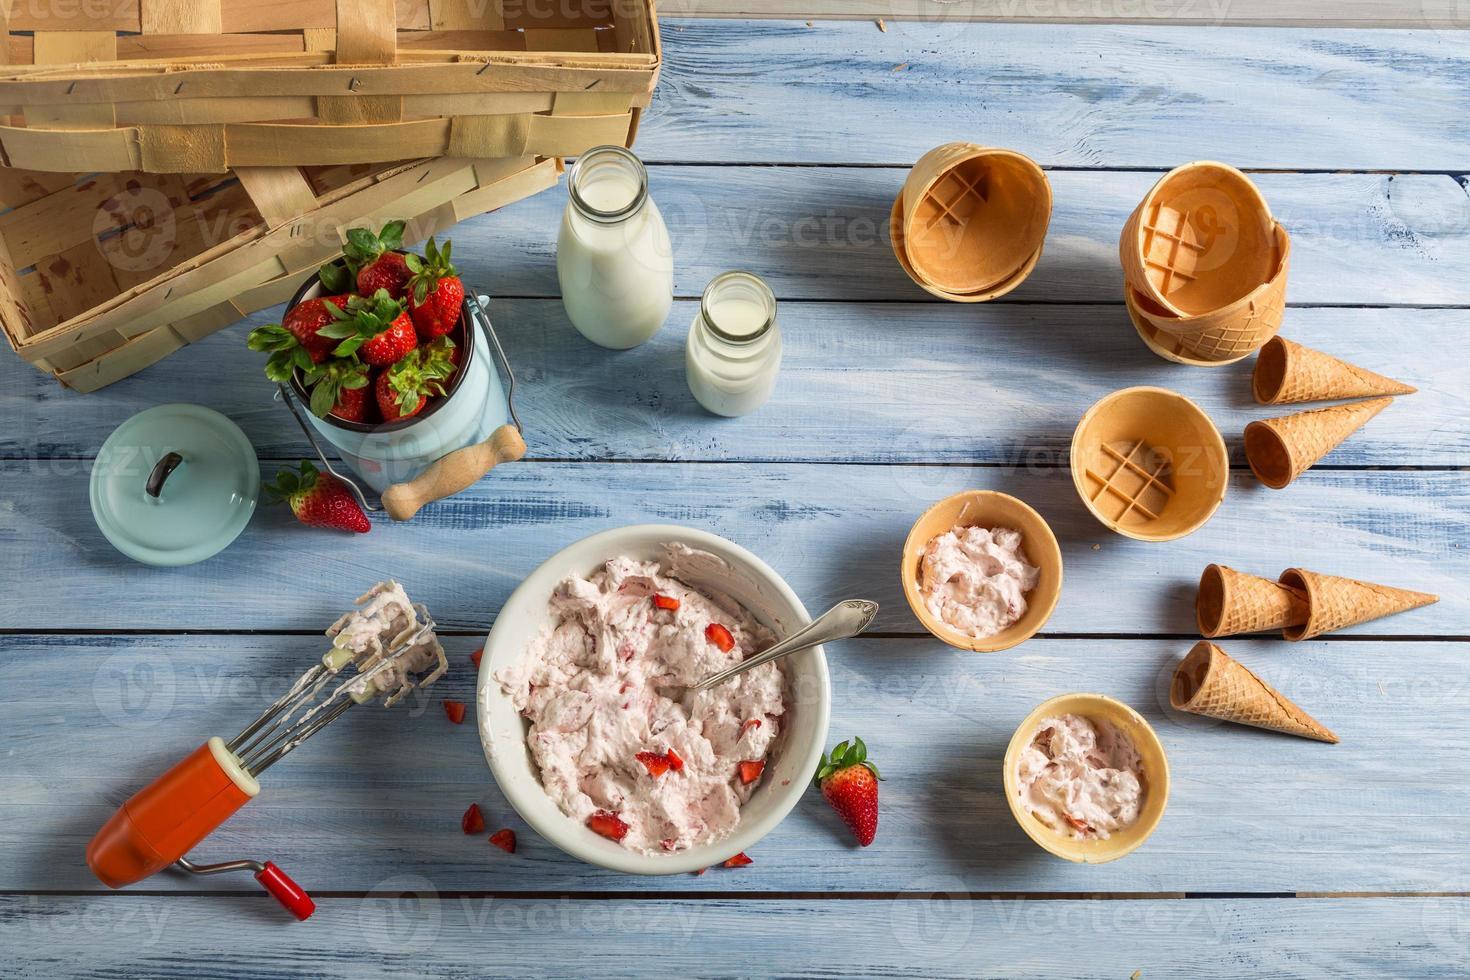 preparando sorvete caseiro de frutas foto